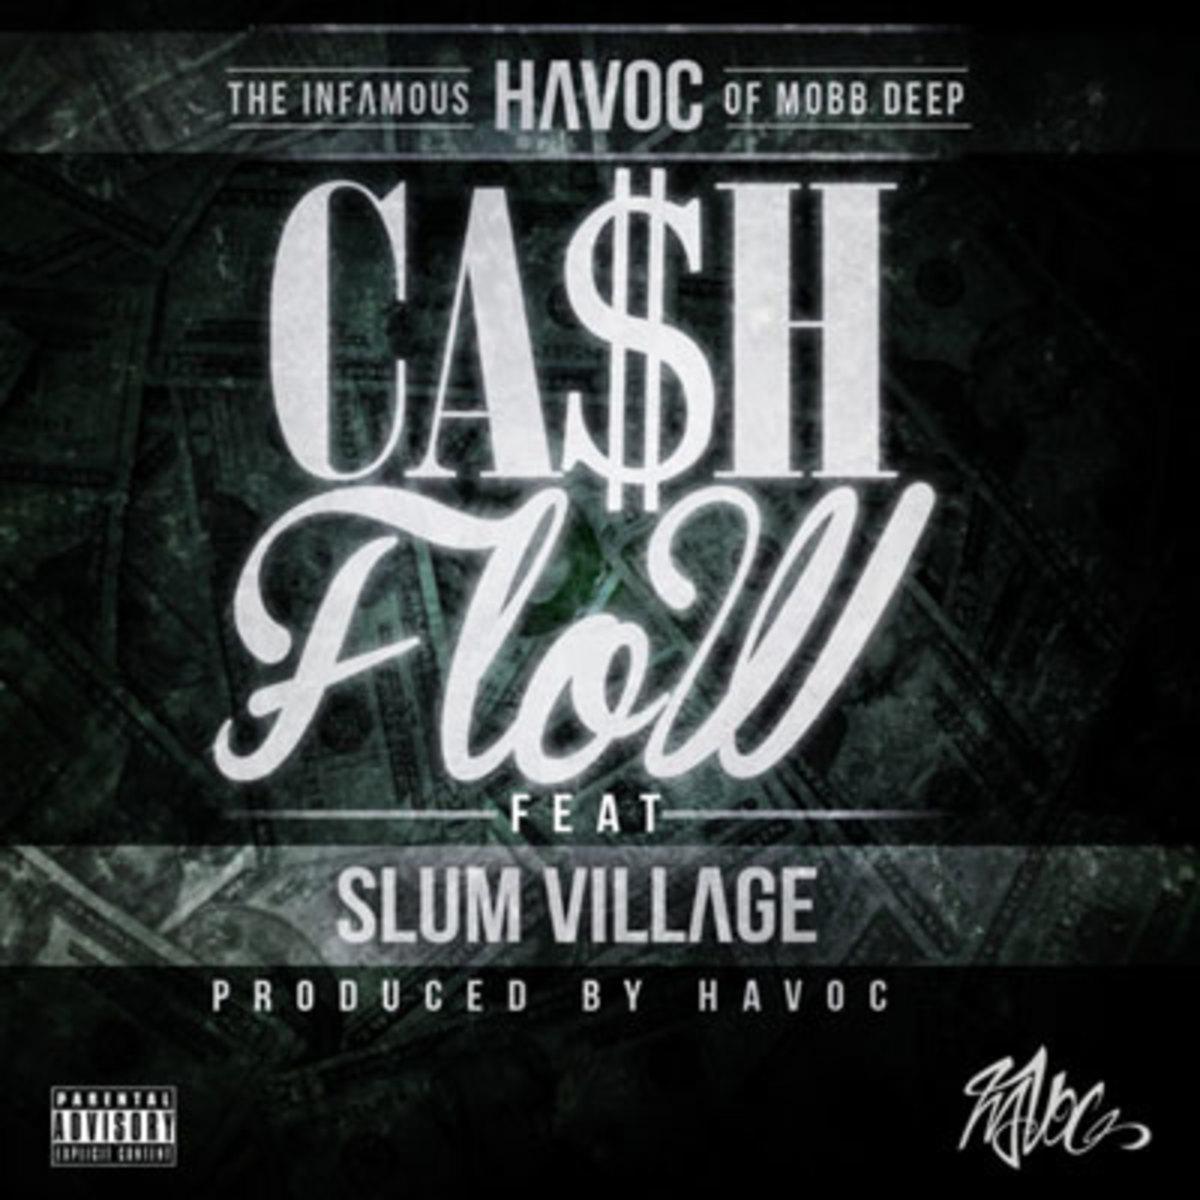 havoc-cashflow.jpg